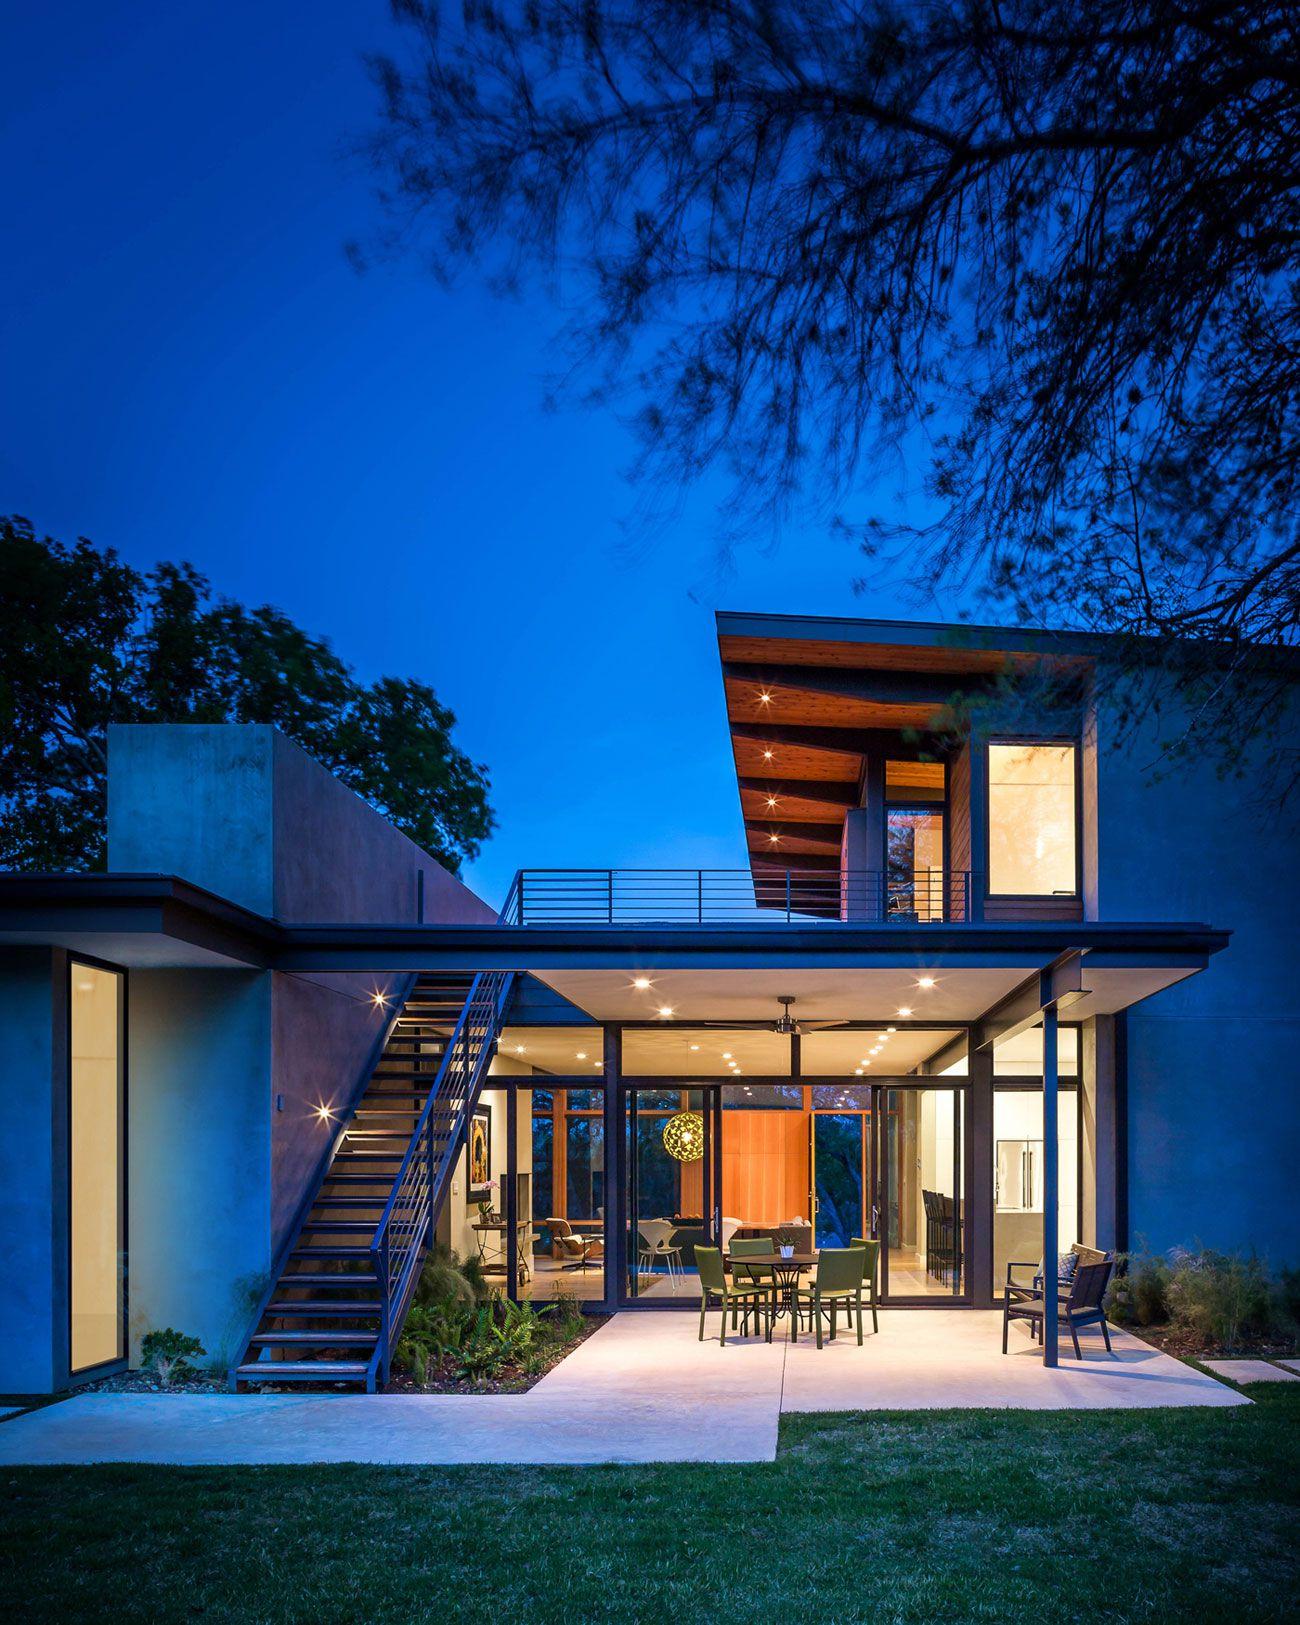 modern Barton Hills Residence by night